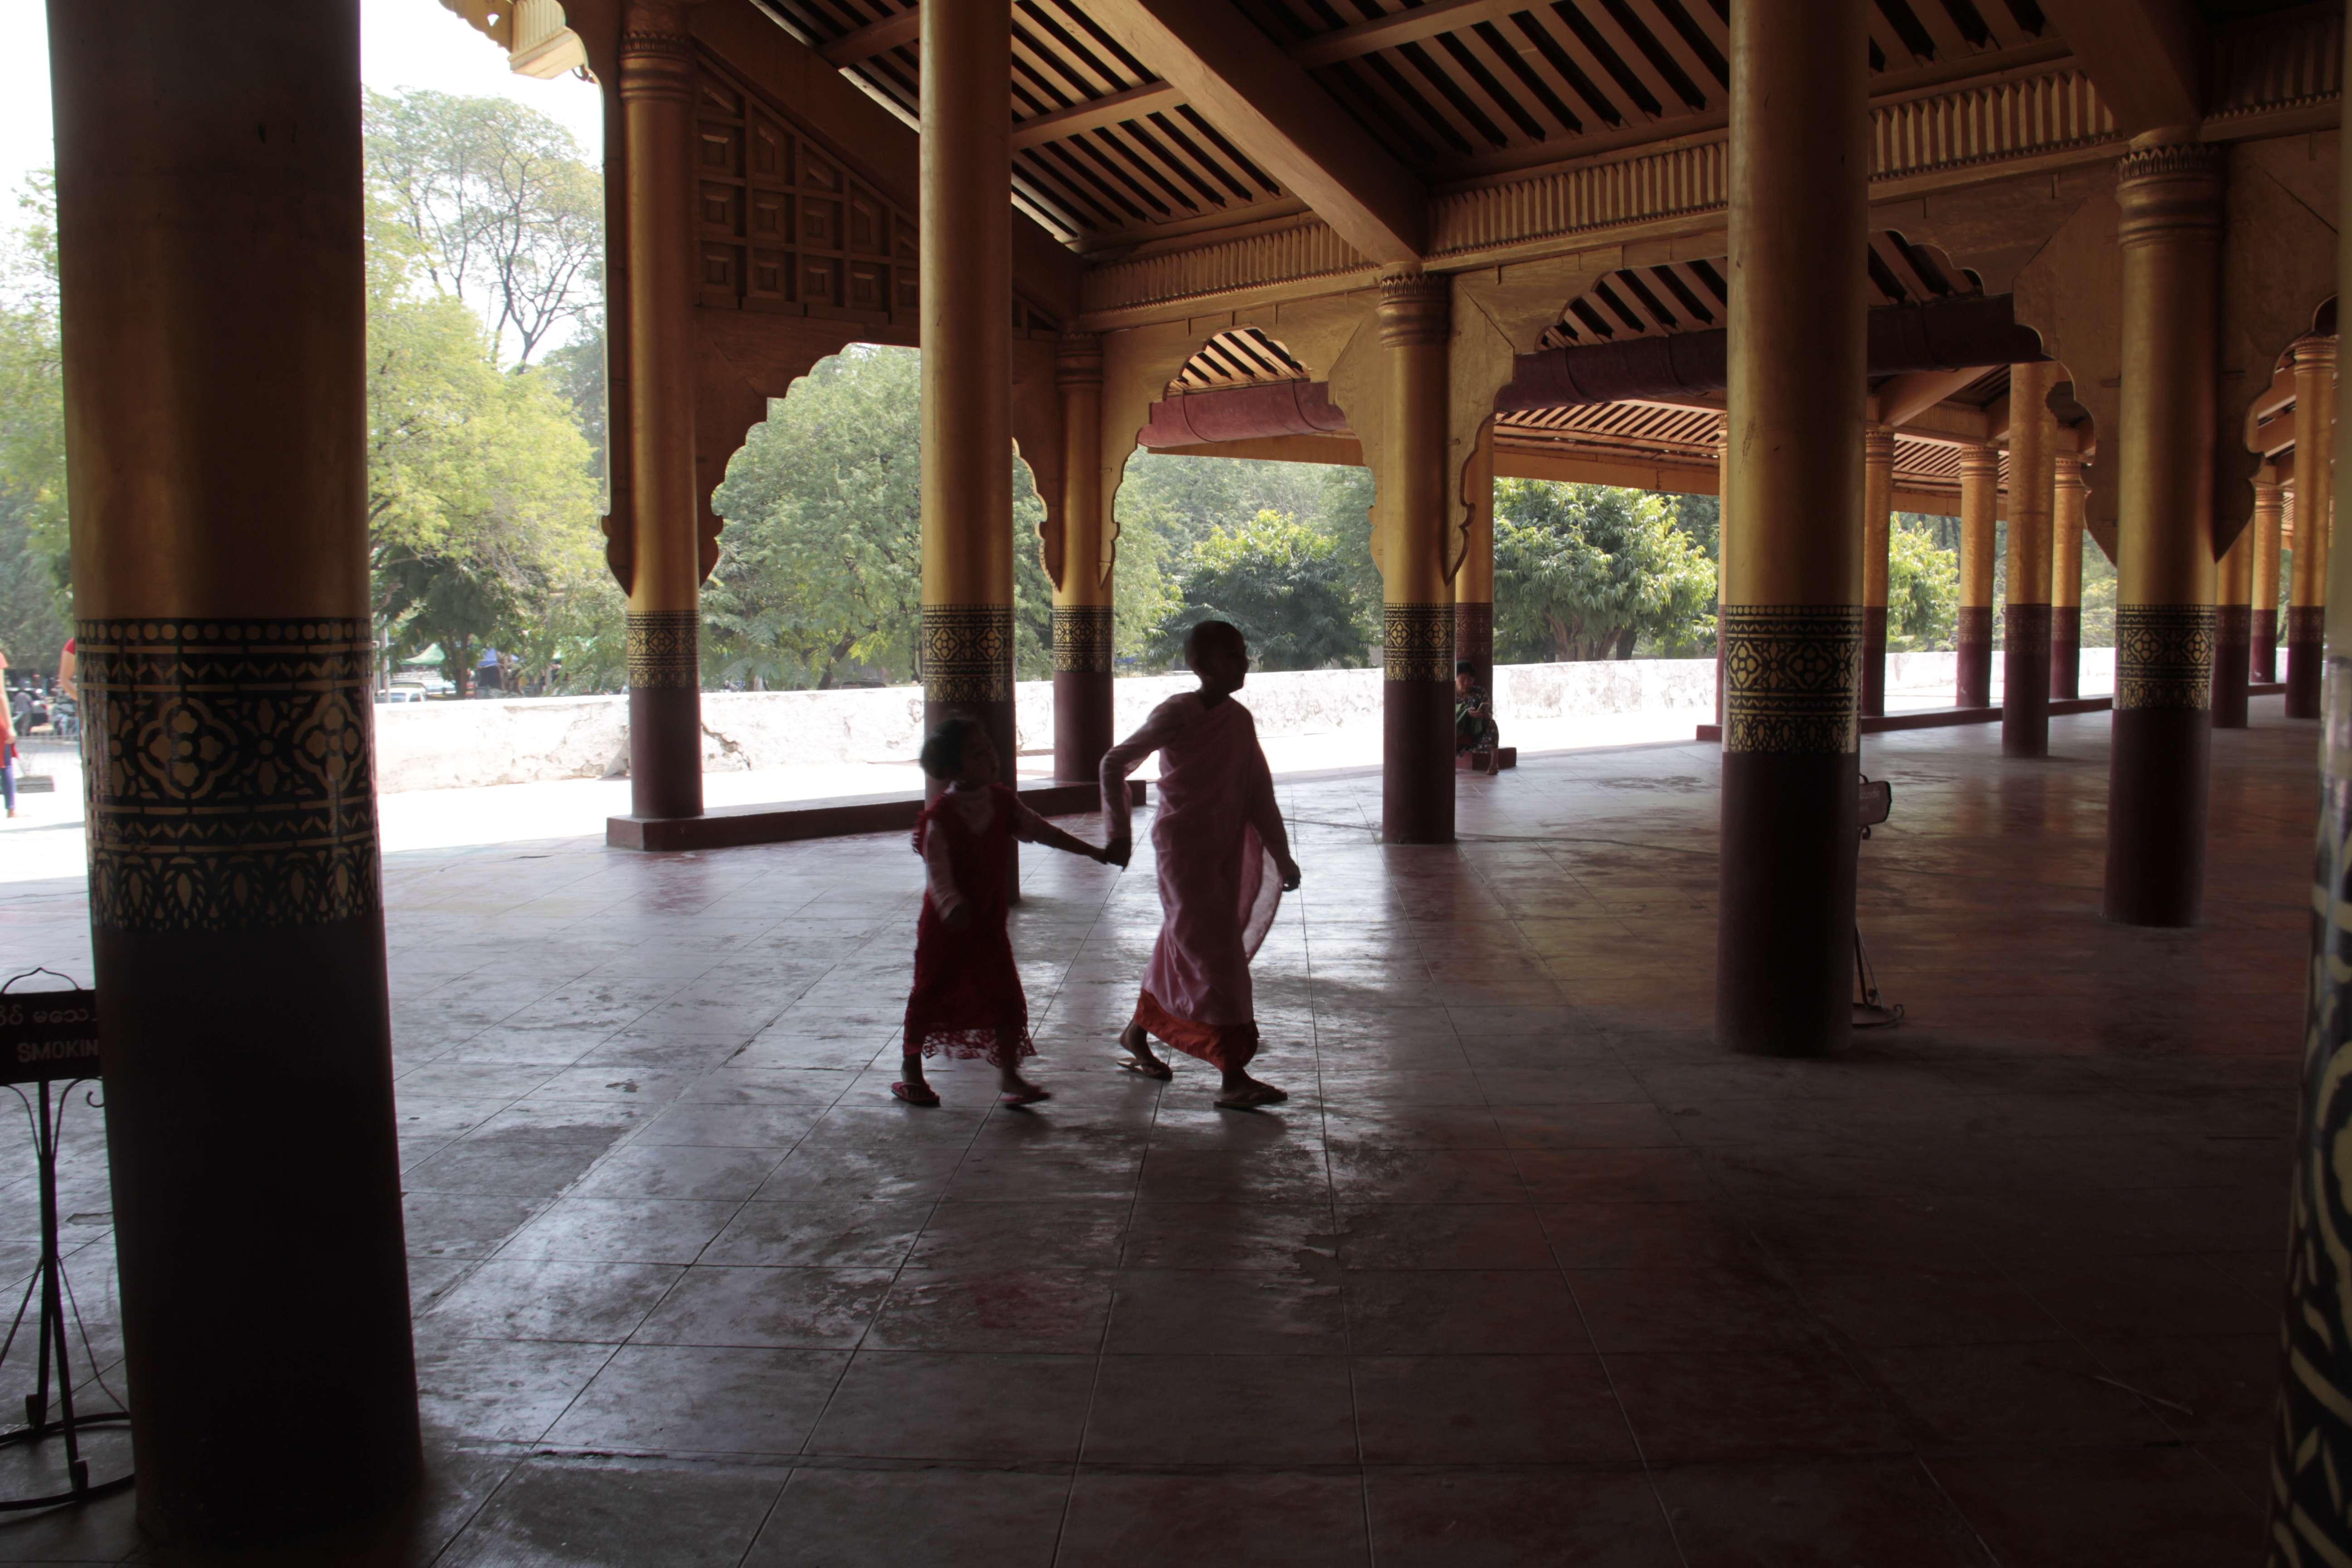 Myanmar fevrier 2019_0862 Mandalay cite imperiale